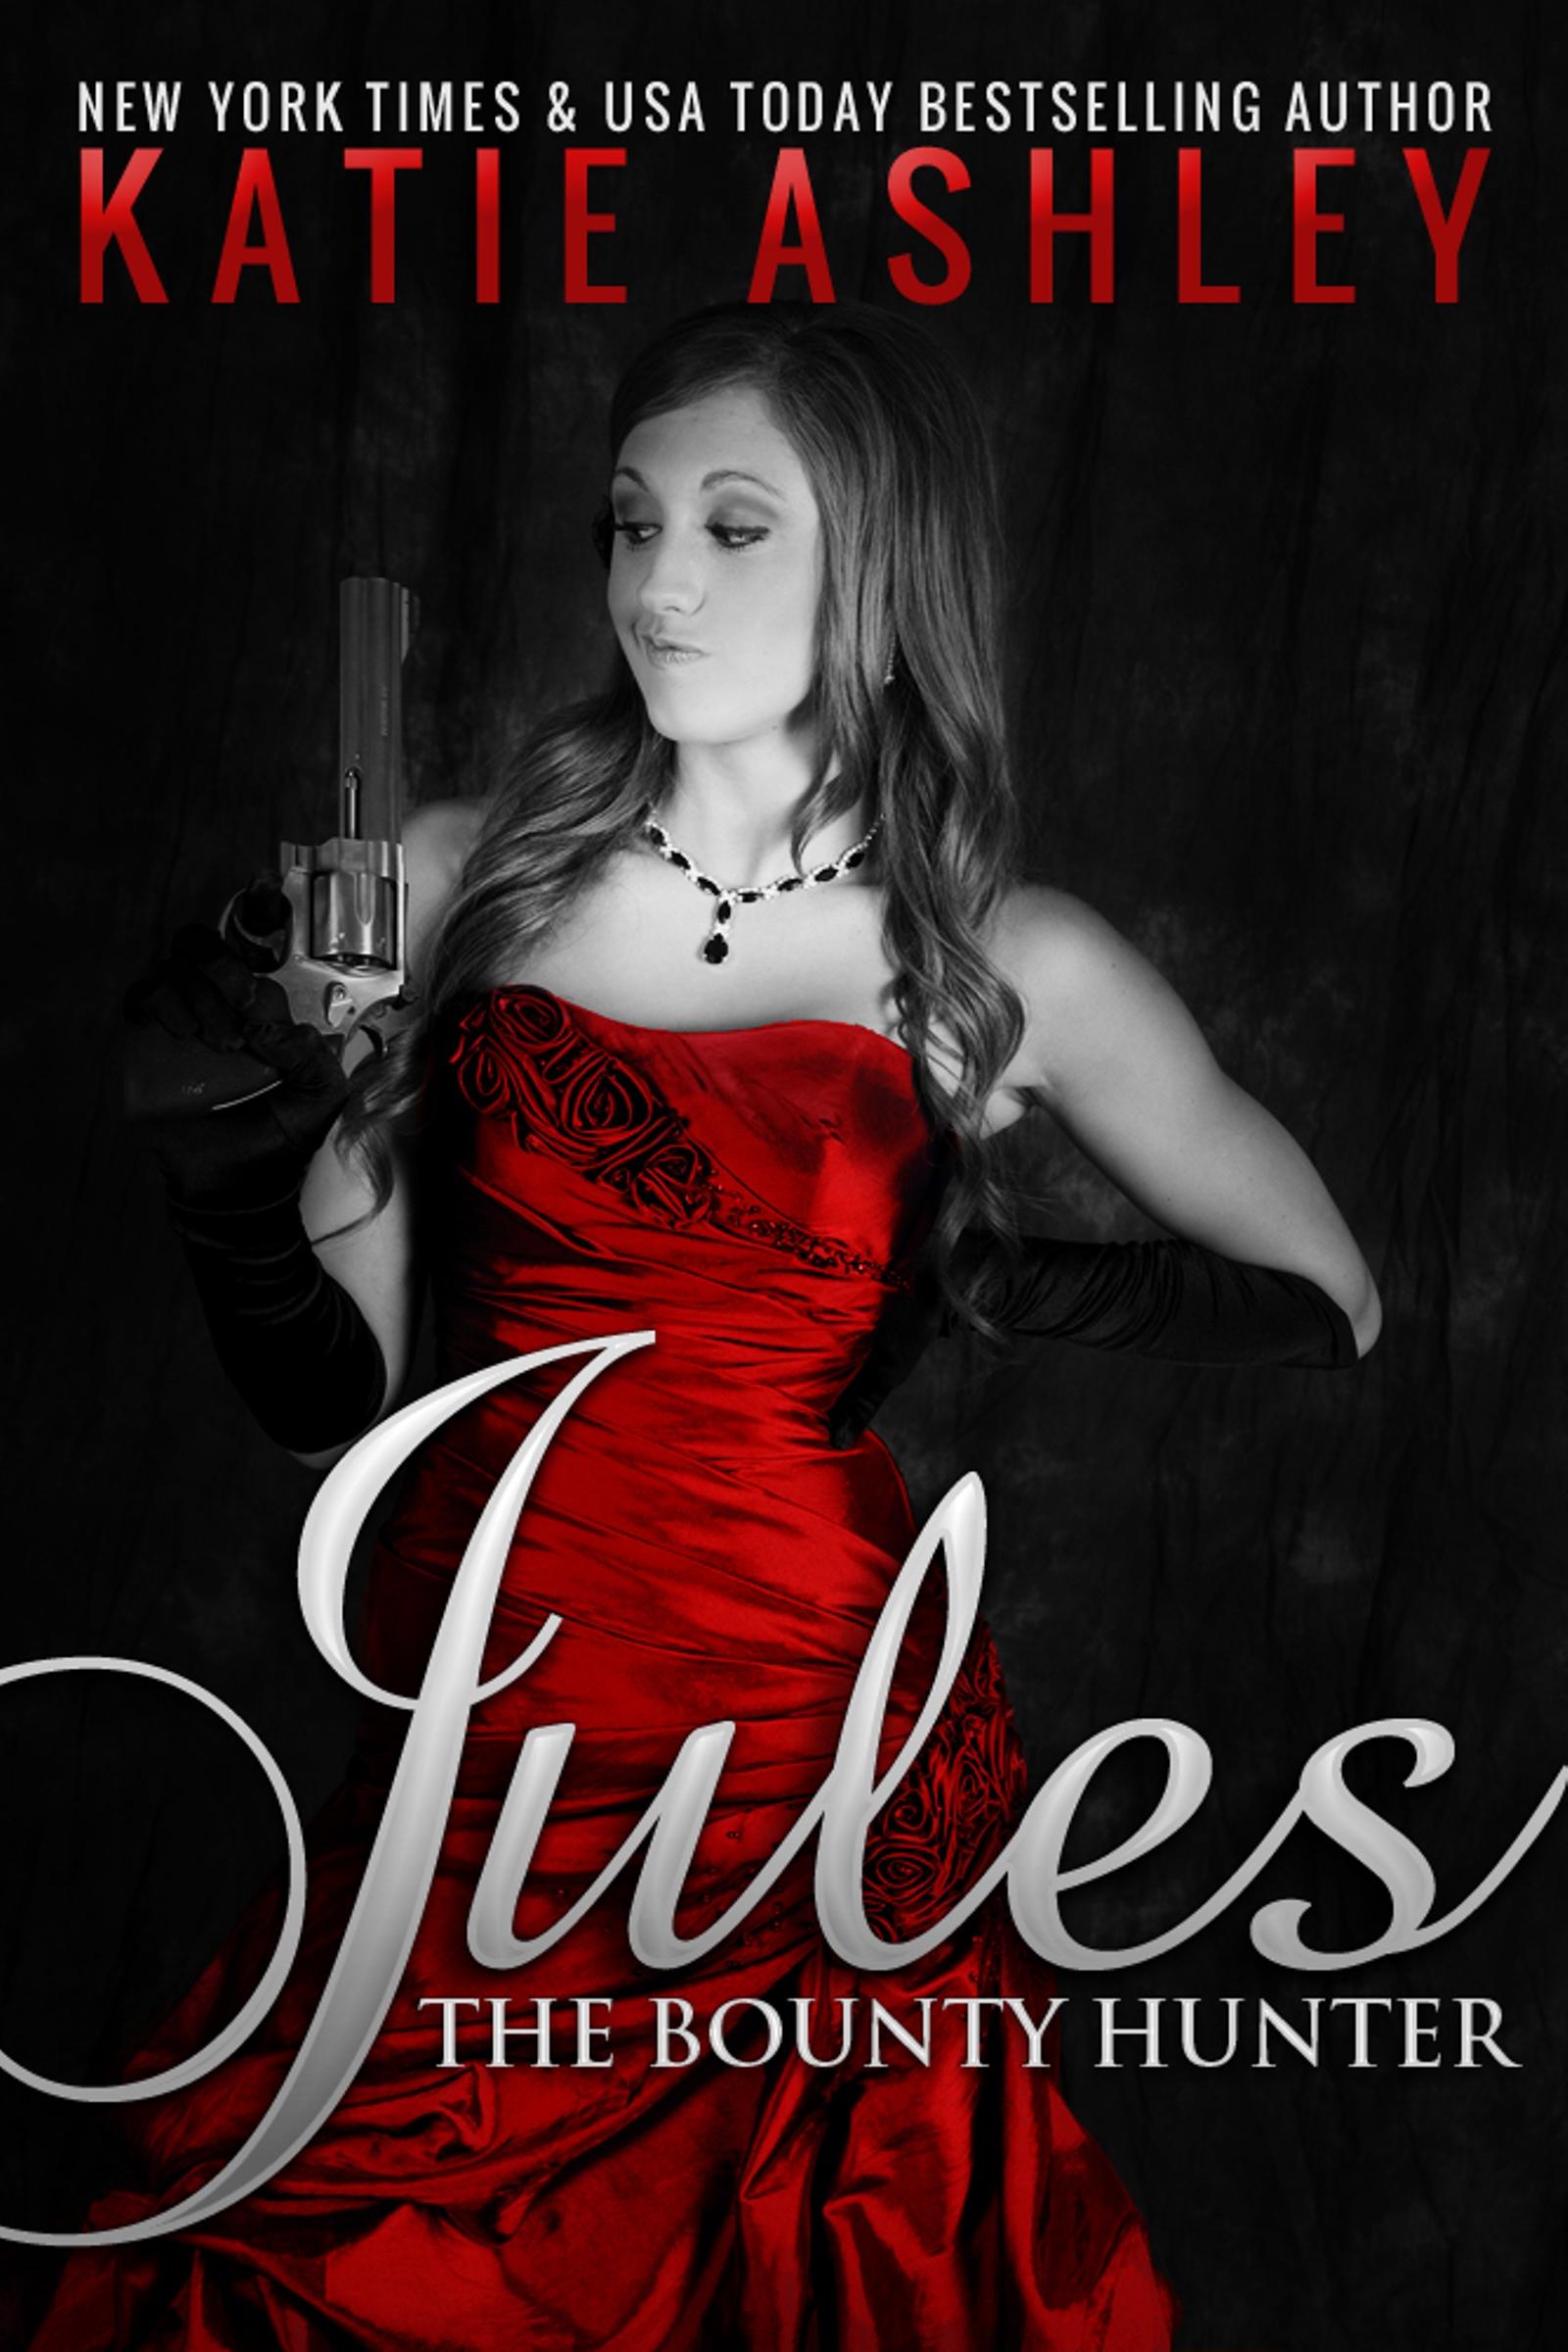 Katie Ashley - Jules, the Bounty Hunter